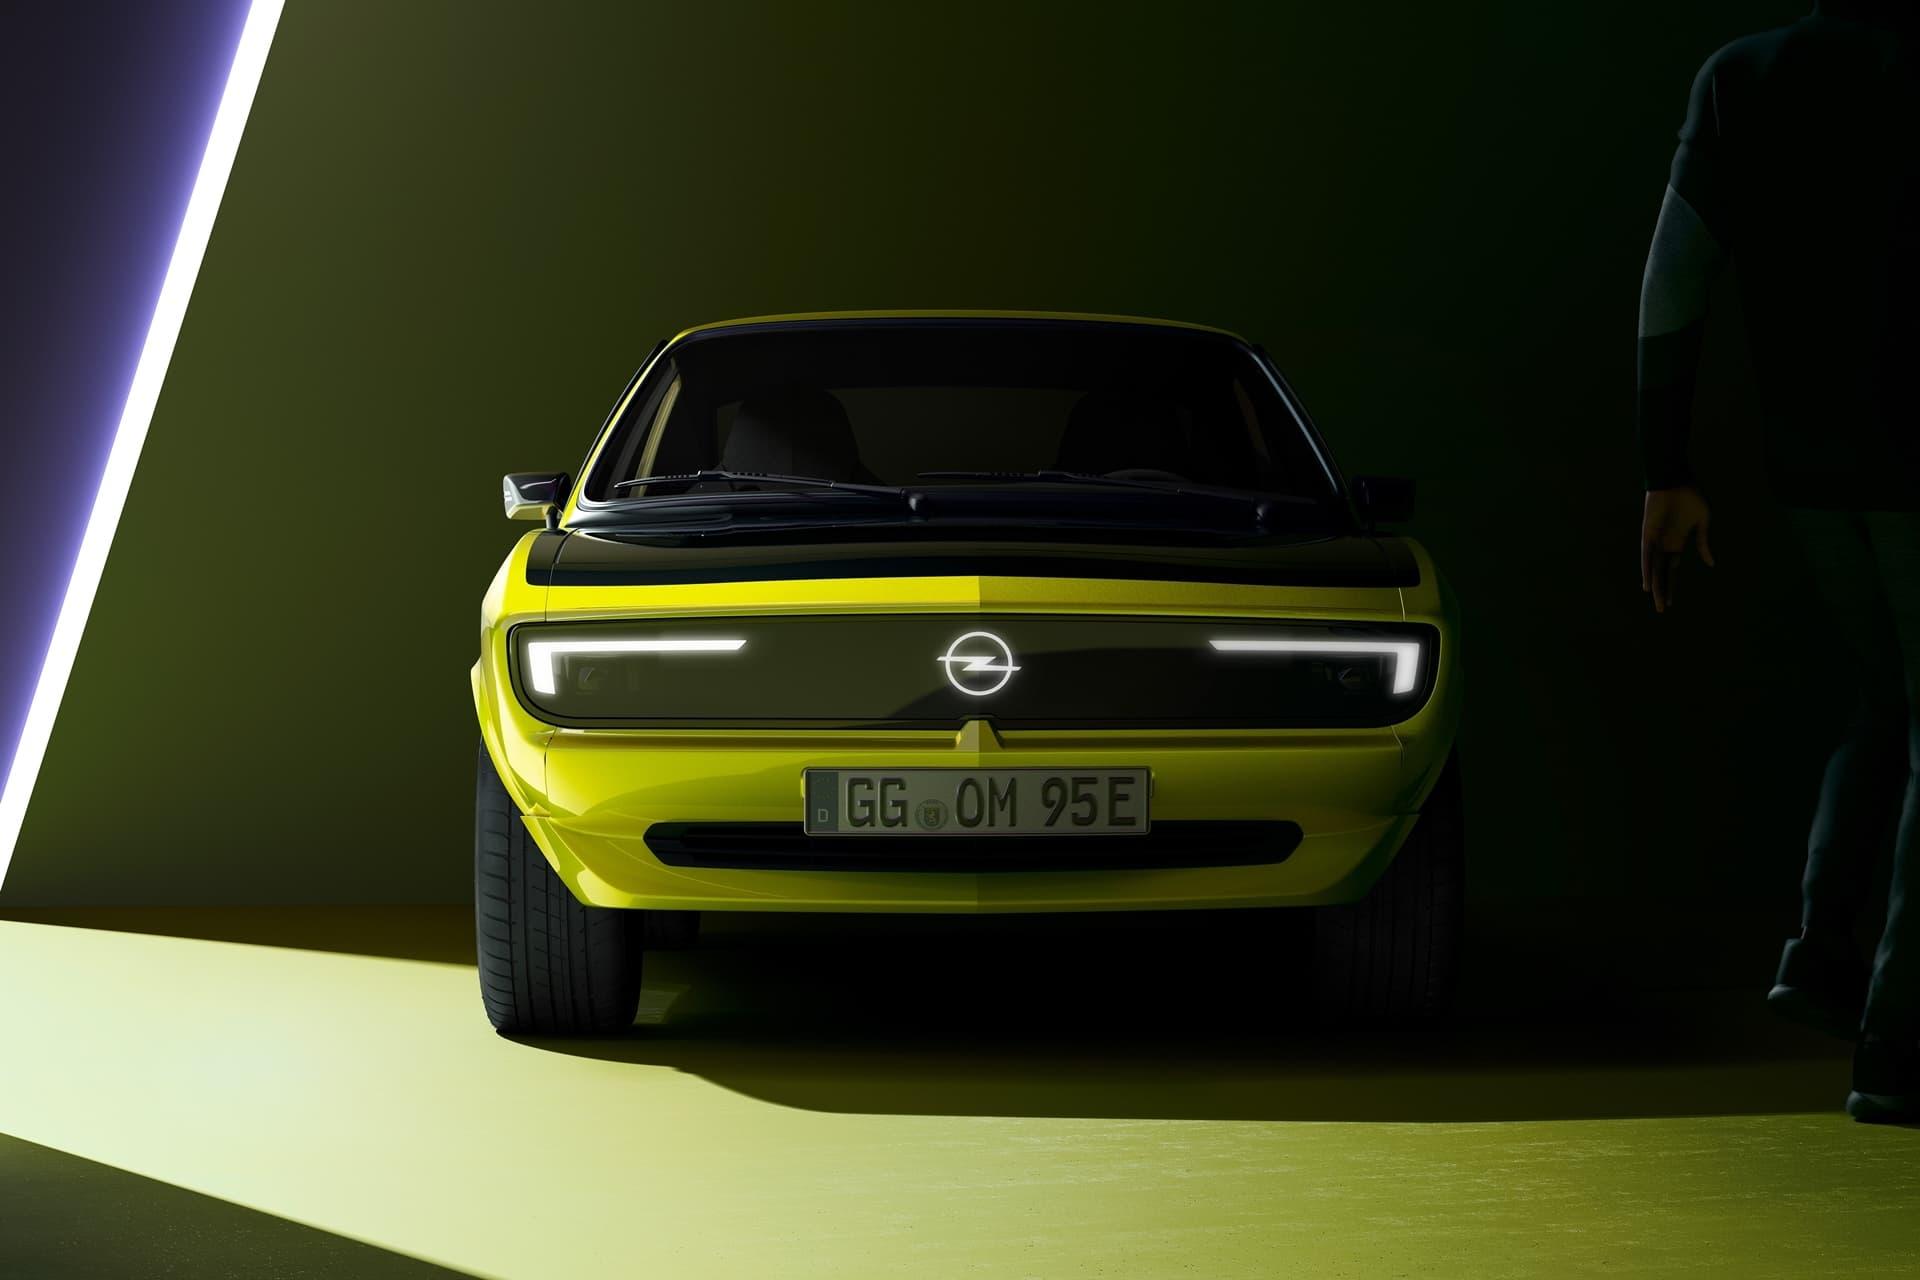 Opel Manta Gse 2021 0421 004